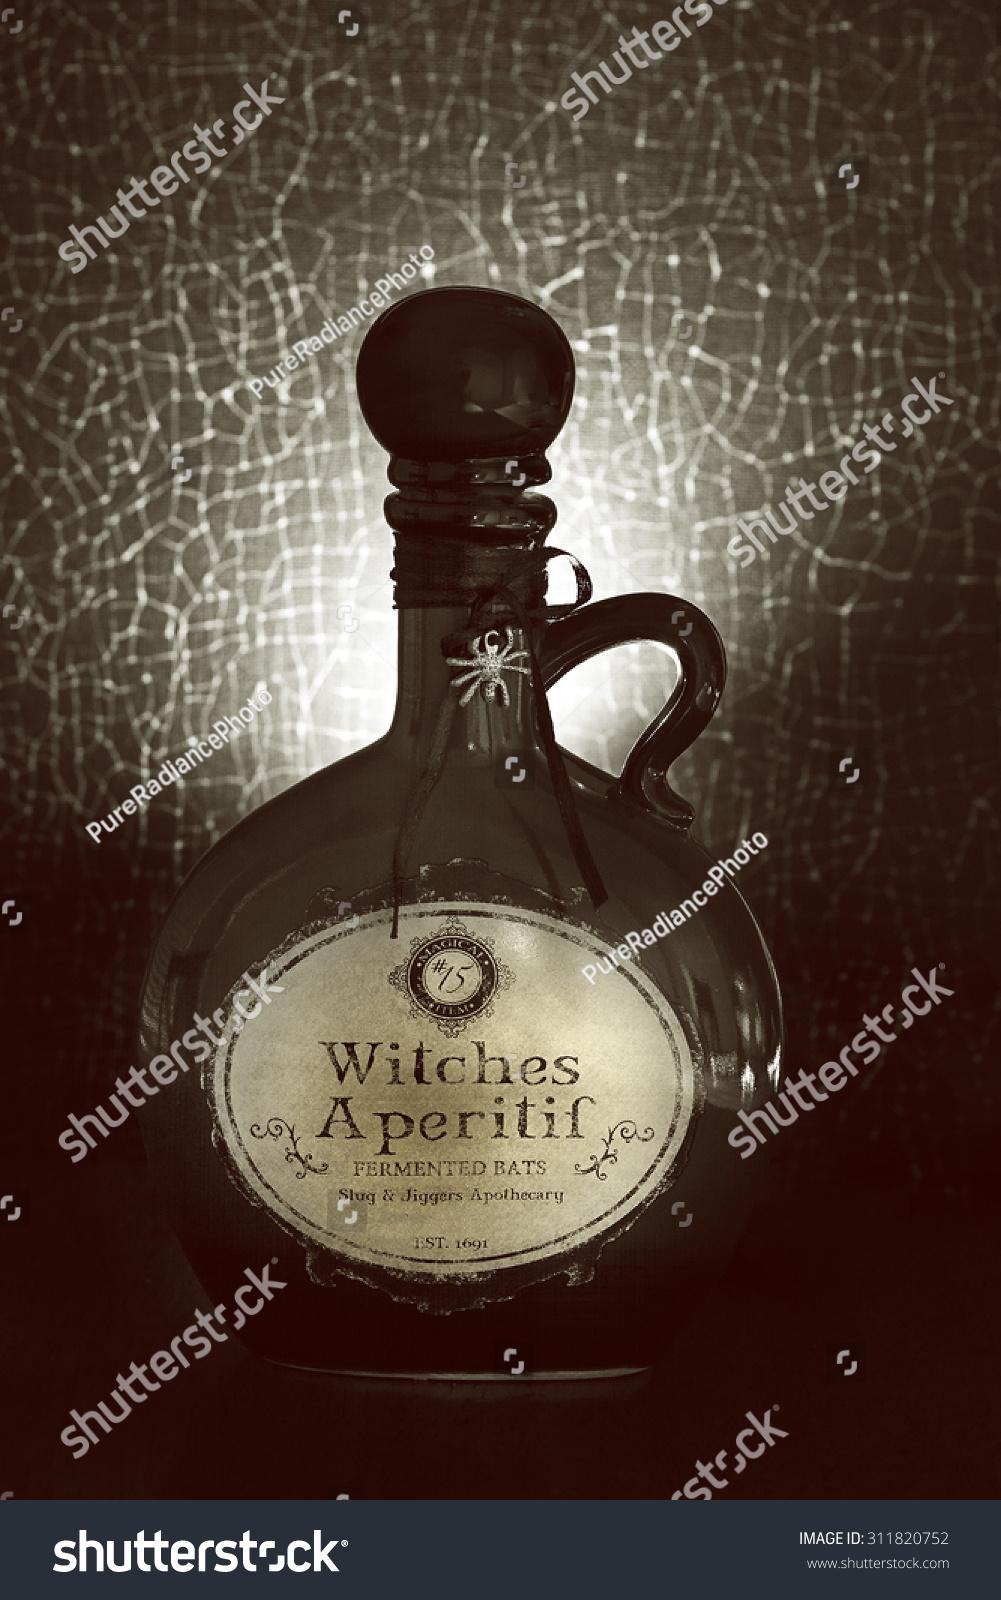 Halloween Witches Apothecary Brew Stock Photo (Edit Now) 311820752